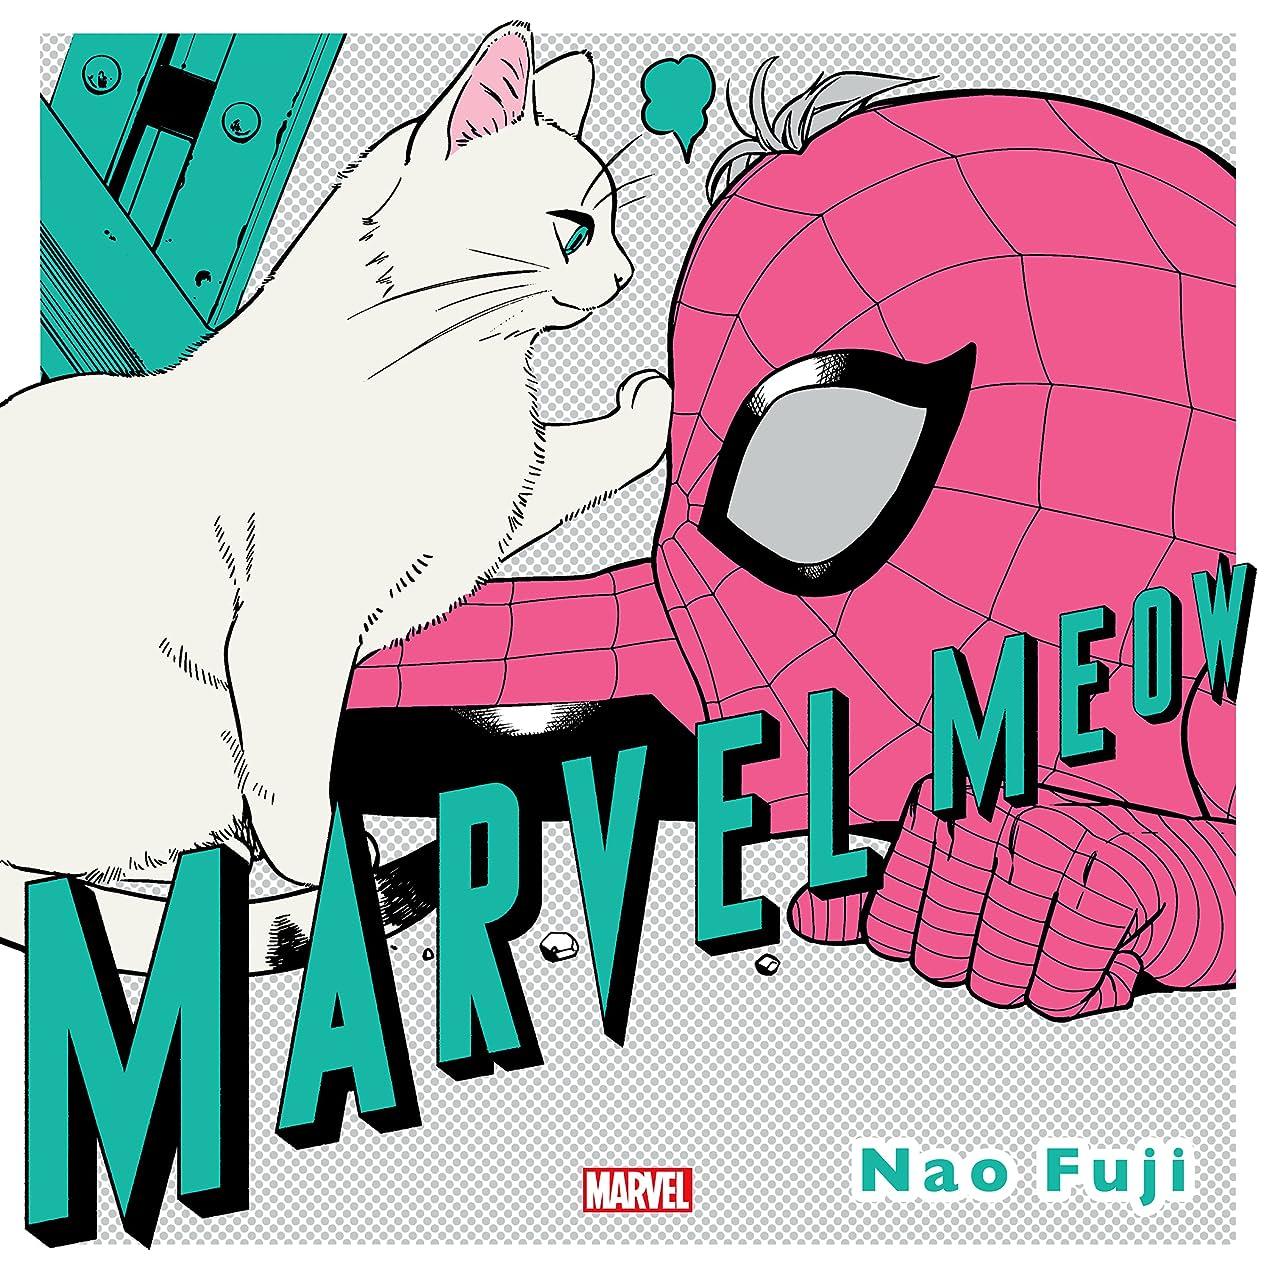 Marvel Meow Vol. 1